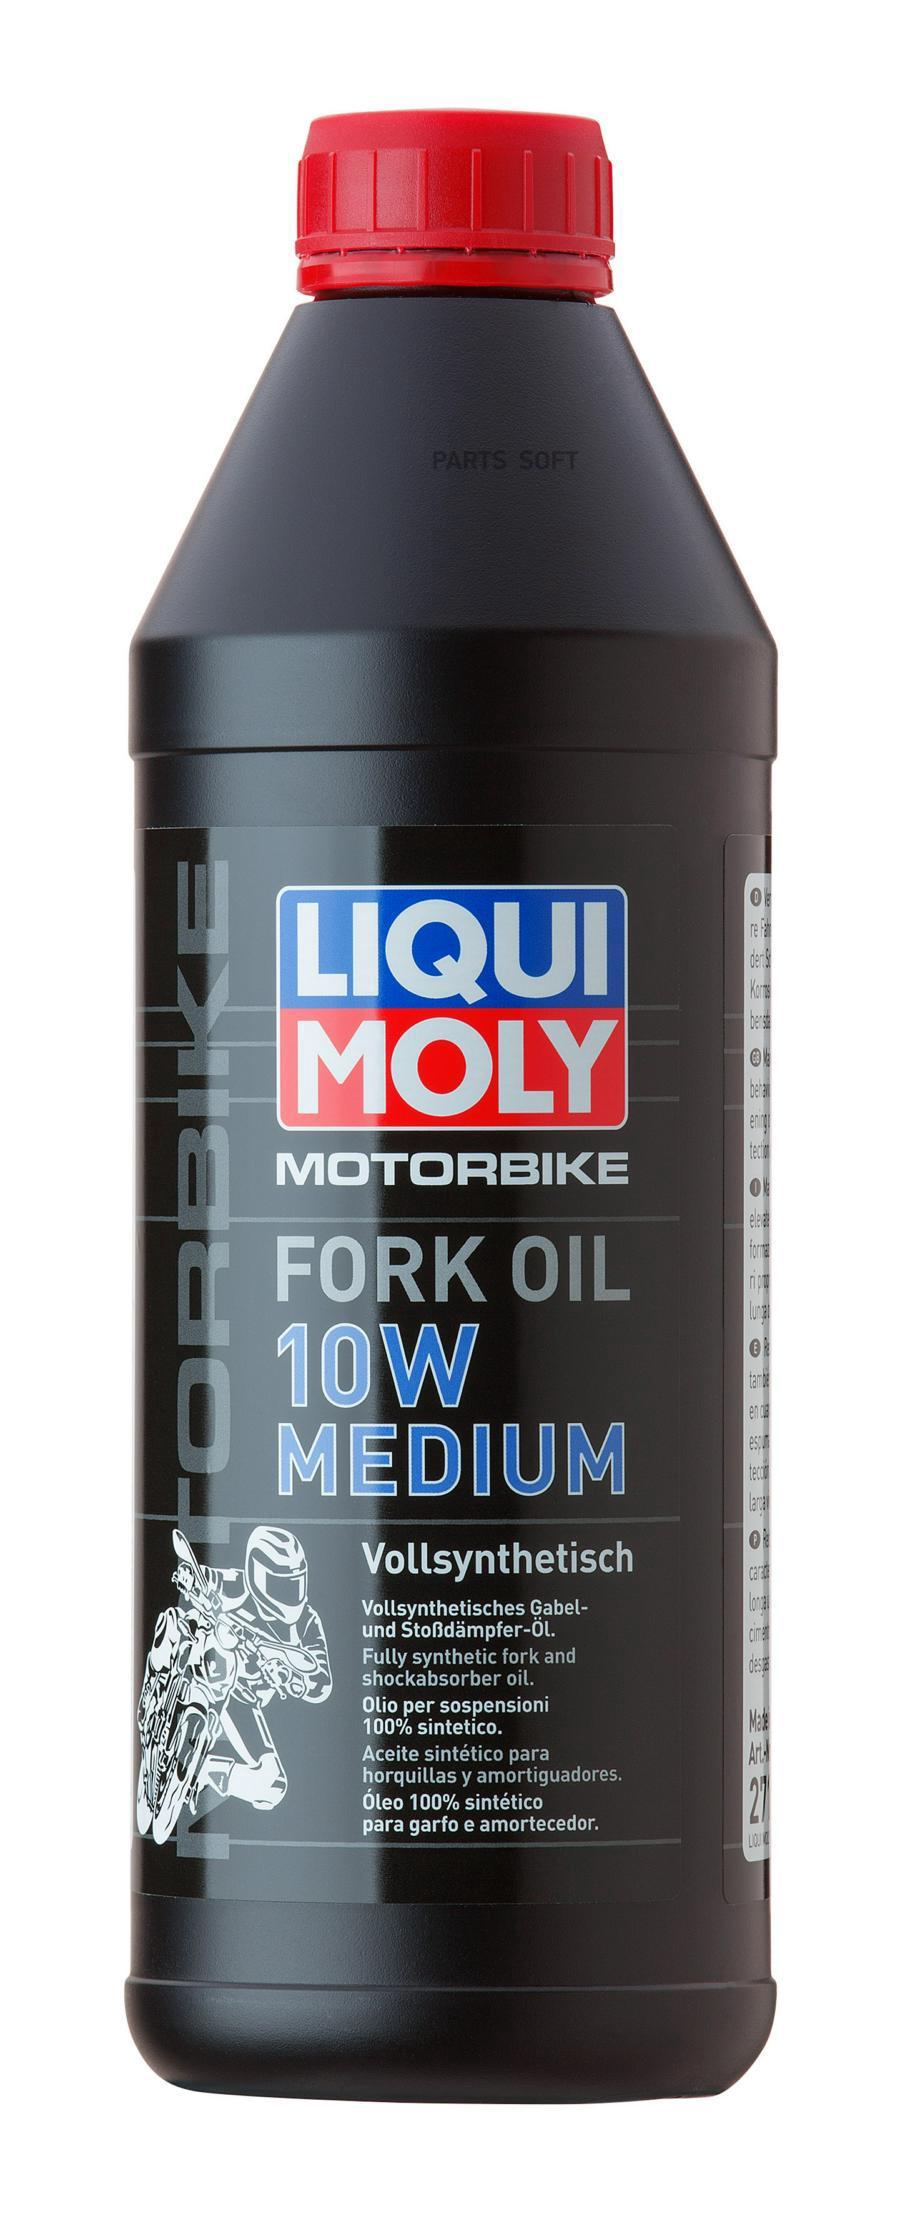 Синт.масло д/вилок и амортиз. motorbike fork oil medium 10w(1л)